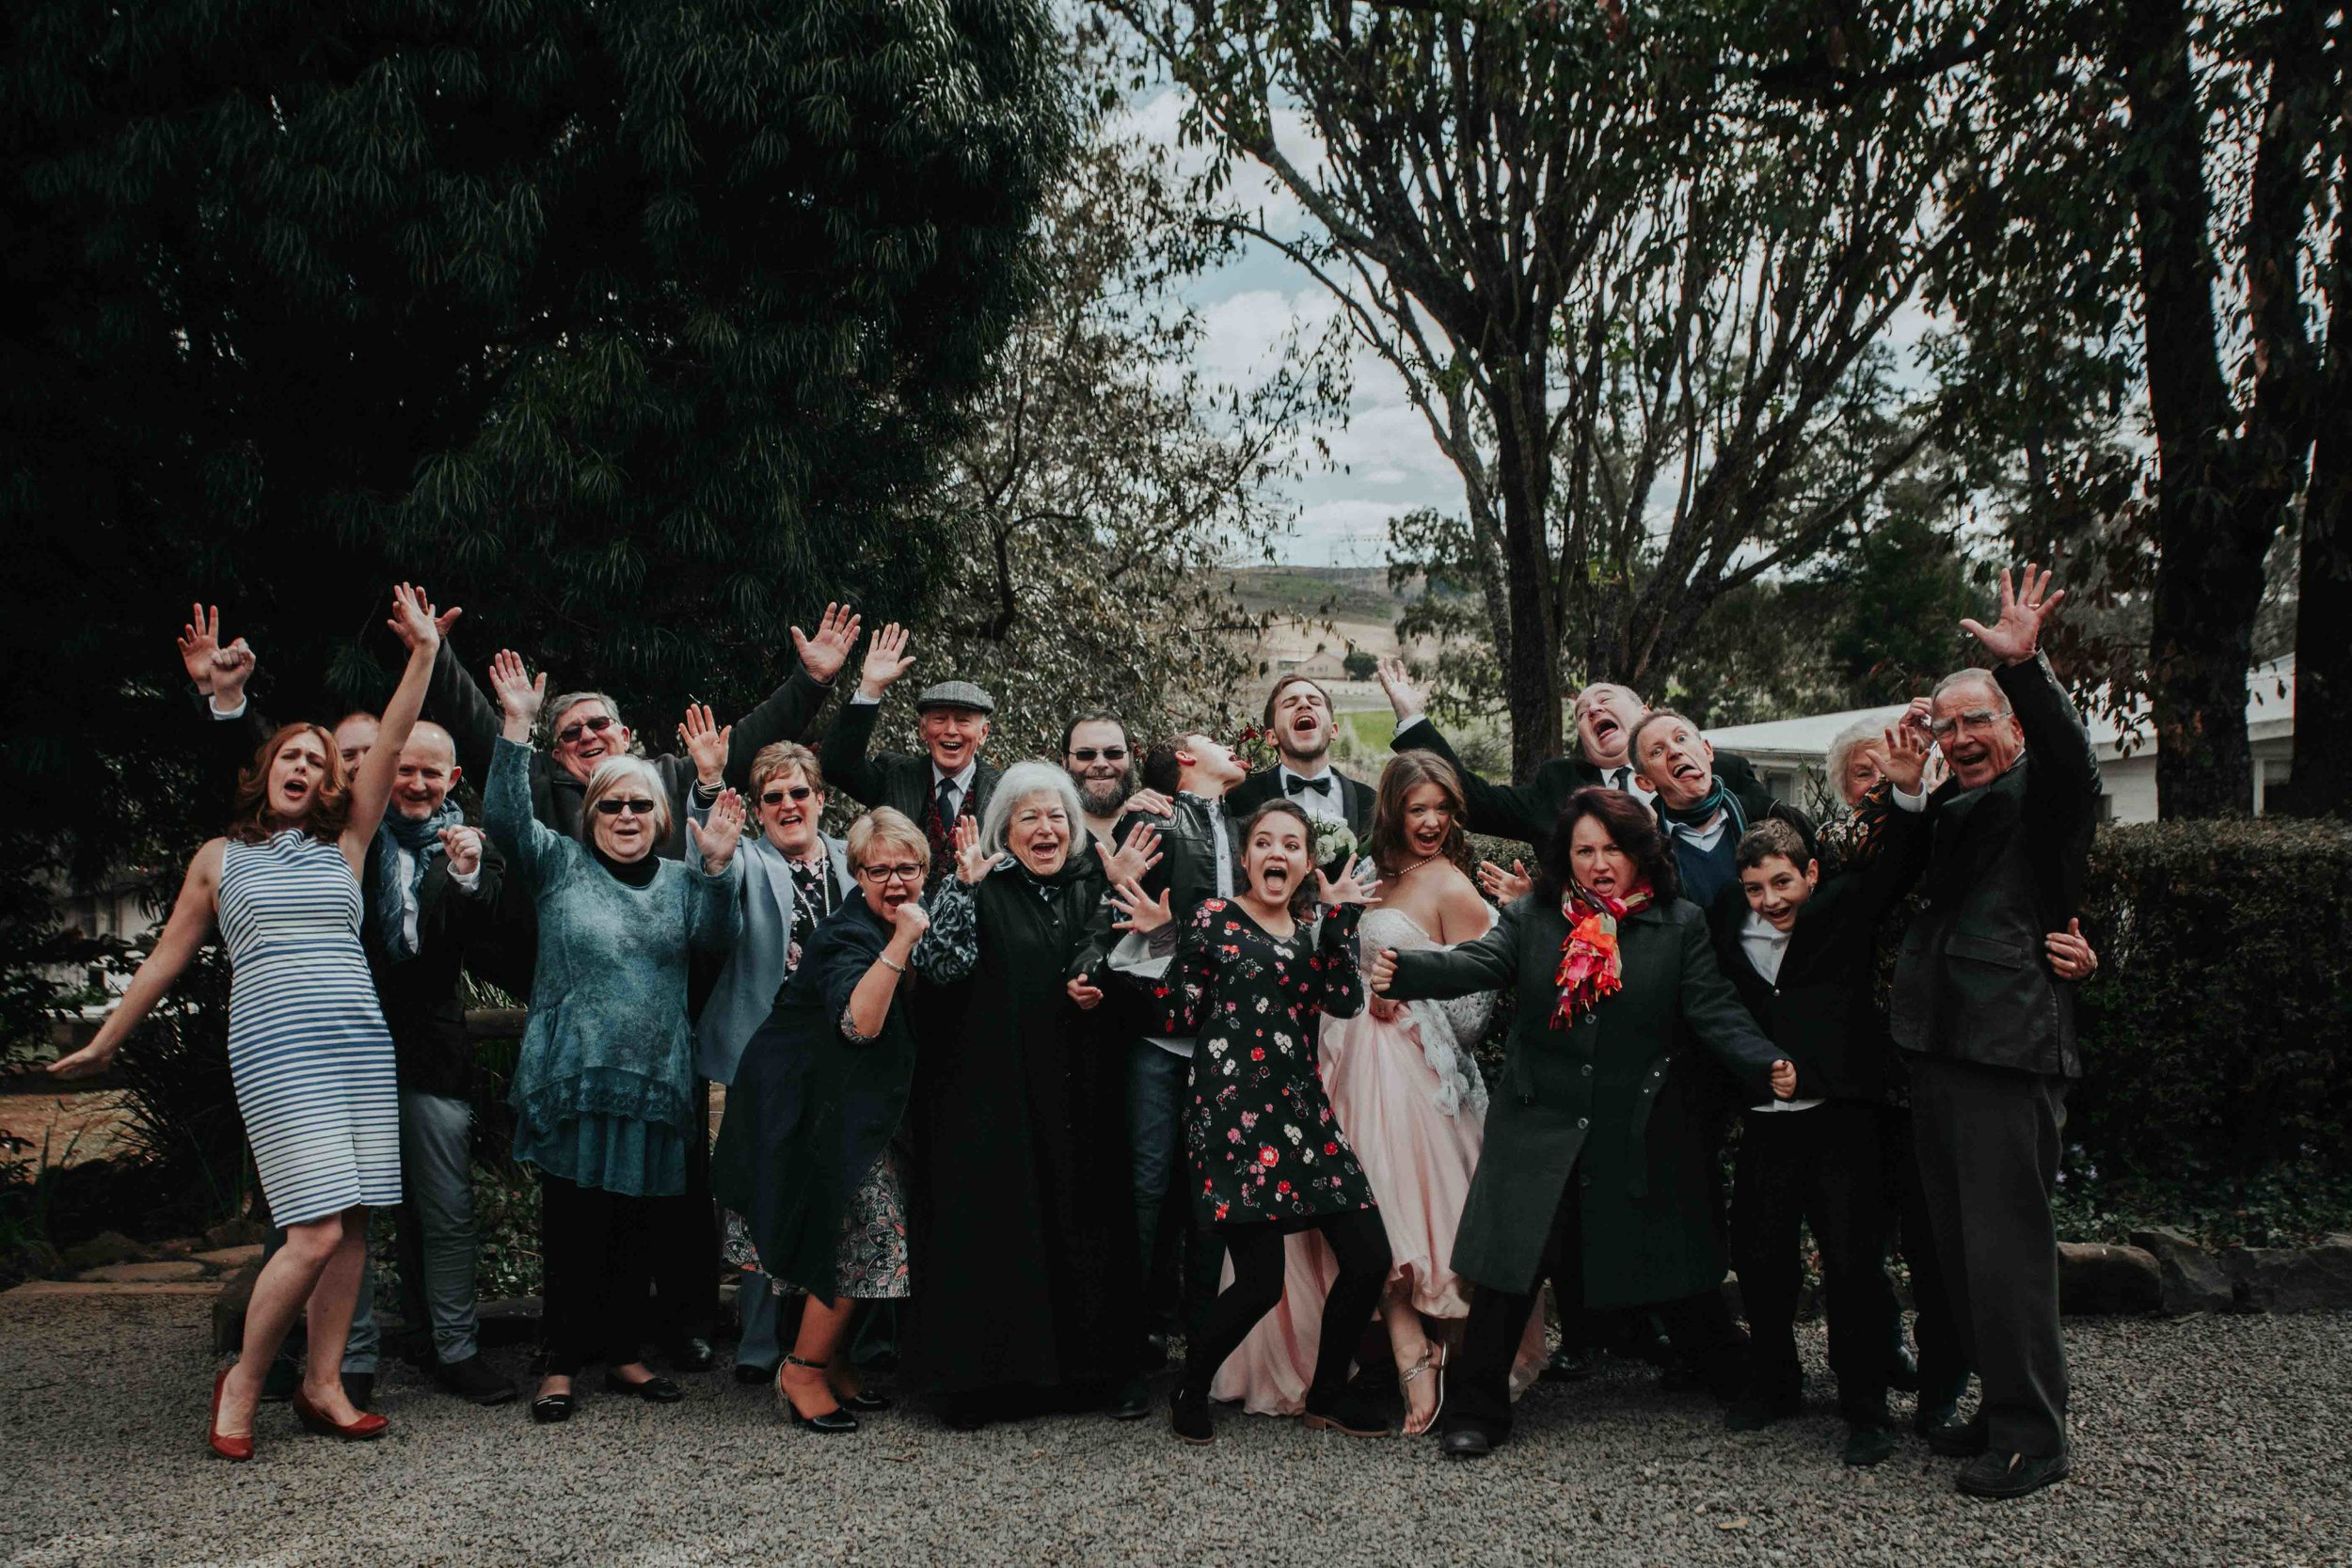 Kristi Smith Photography - Wedding Photography - Darryl & Meg 11.jpg